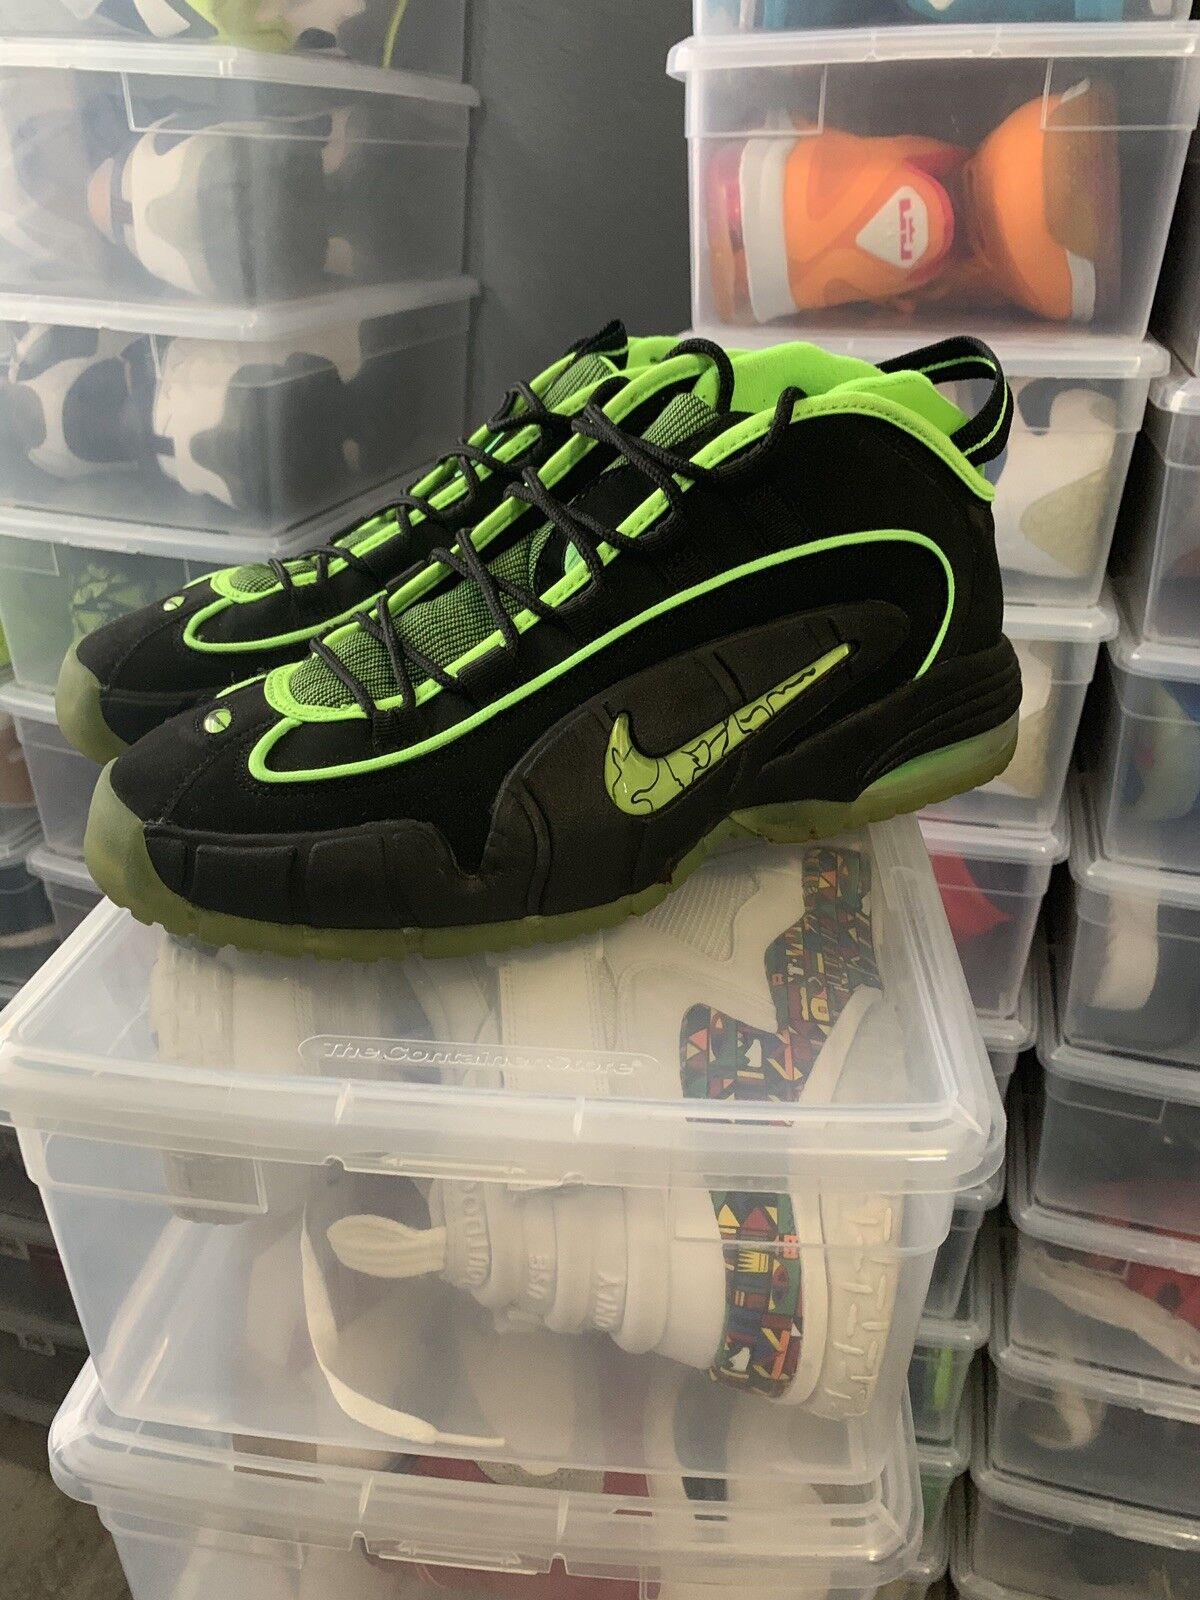 Nike air Penny 1 Sz 12 Hoh Highlighter